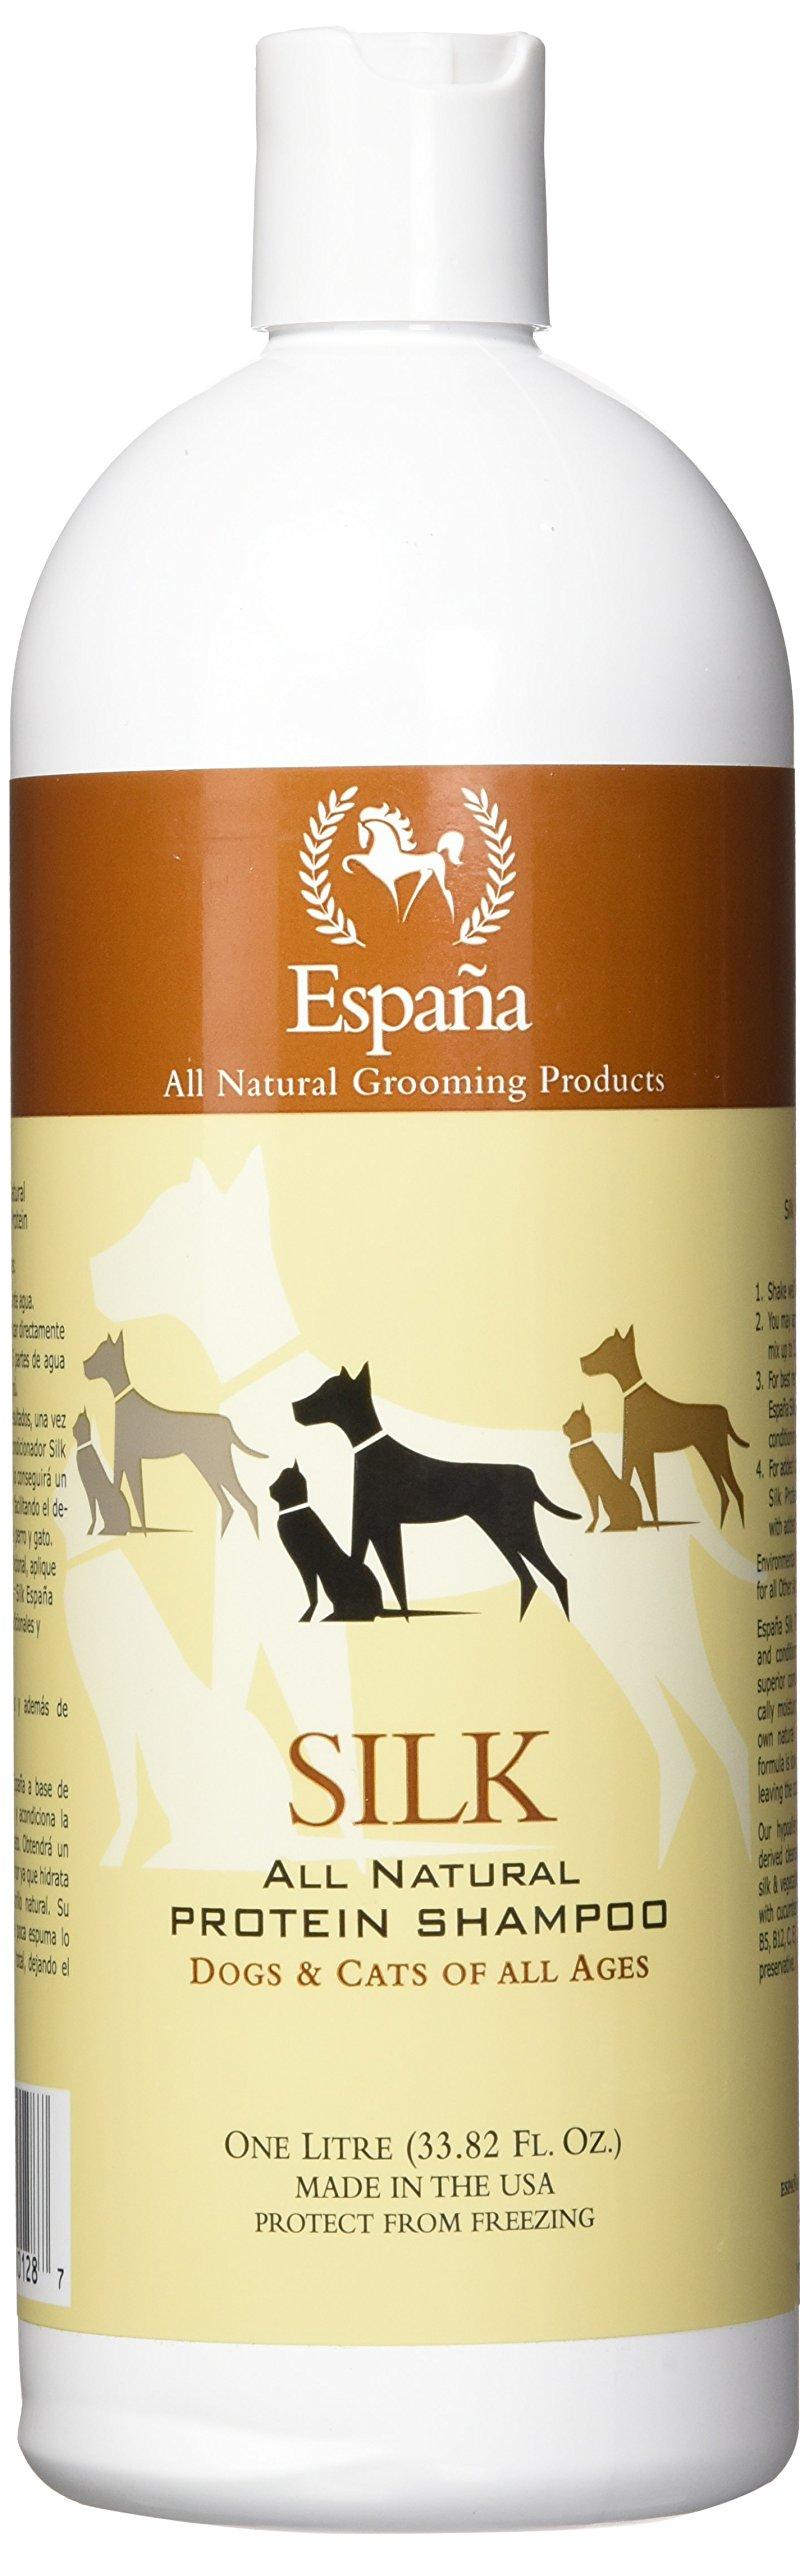 Espana Silk ESP0020DC Specially Formulated Silk Protein Shampoo for Dogs and Cats, 33.82-Ounce by EspanaSILK